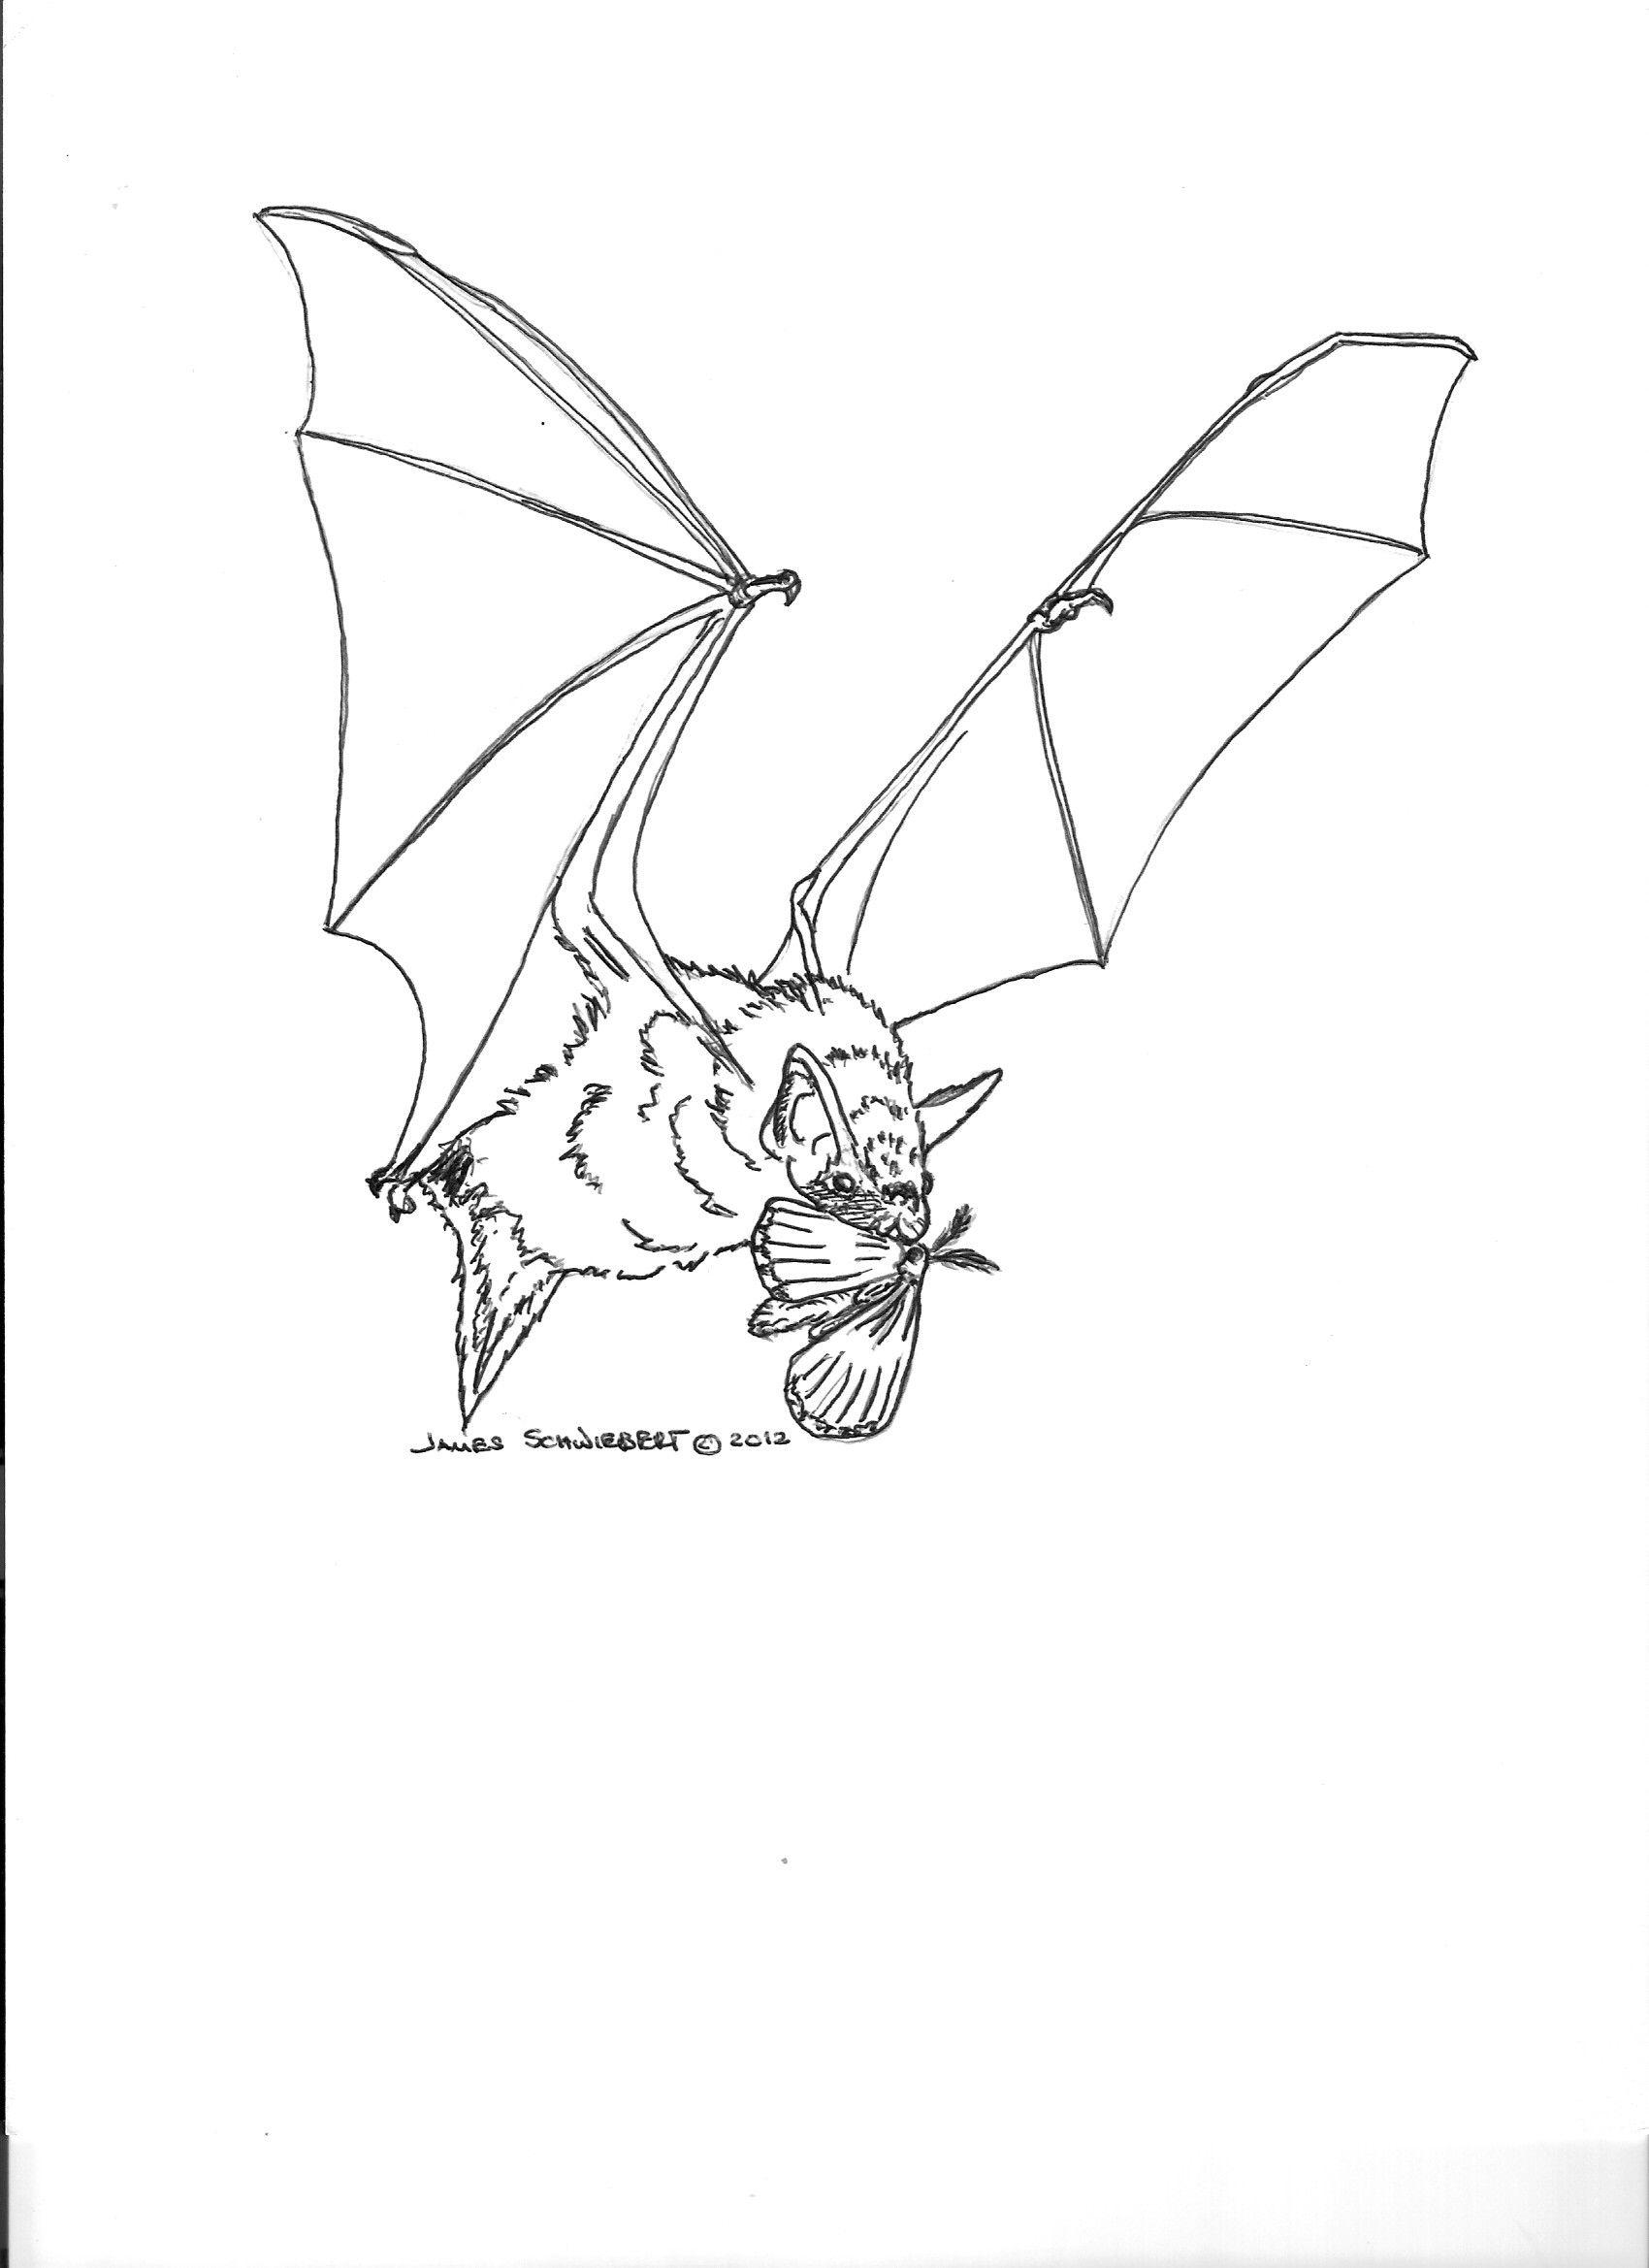 Bat coloring page | Batty goodness | Pinterest | Bats